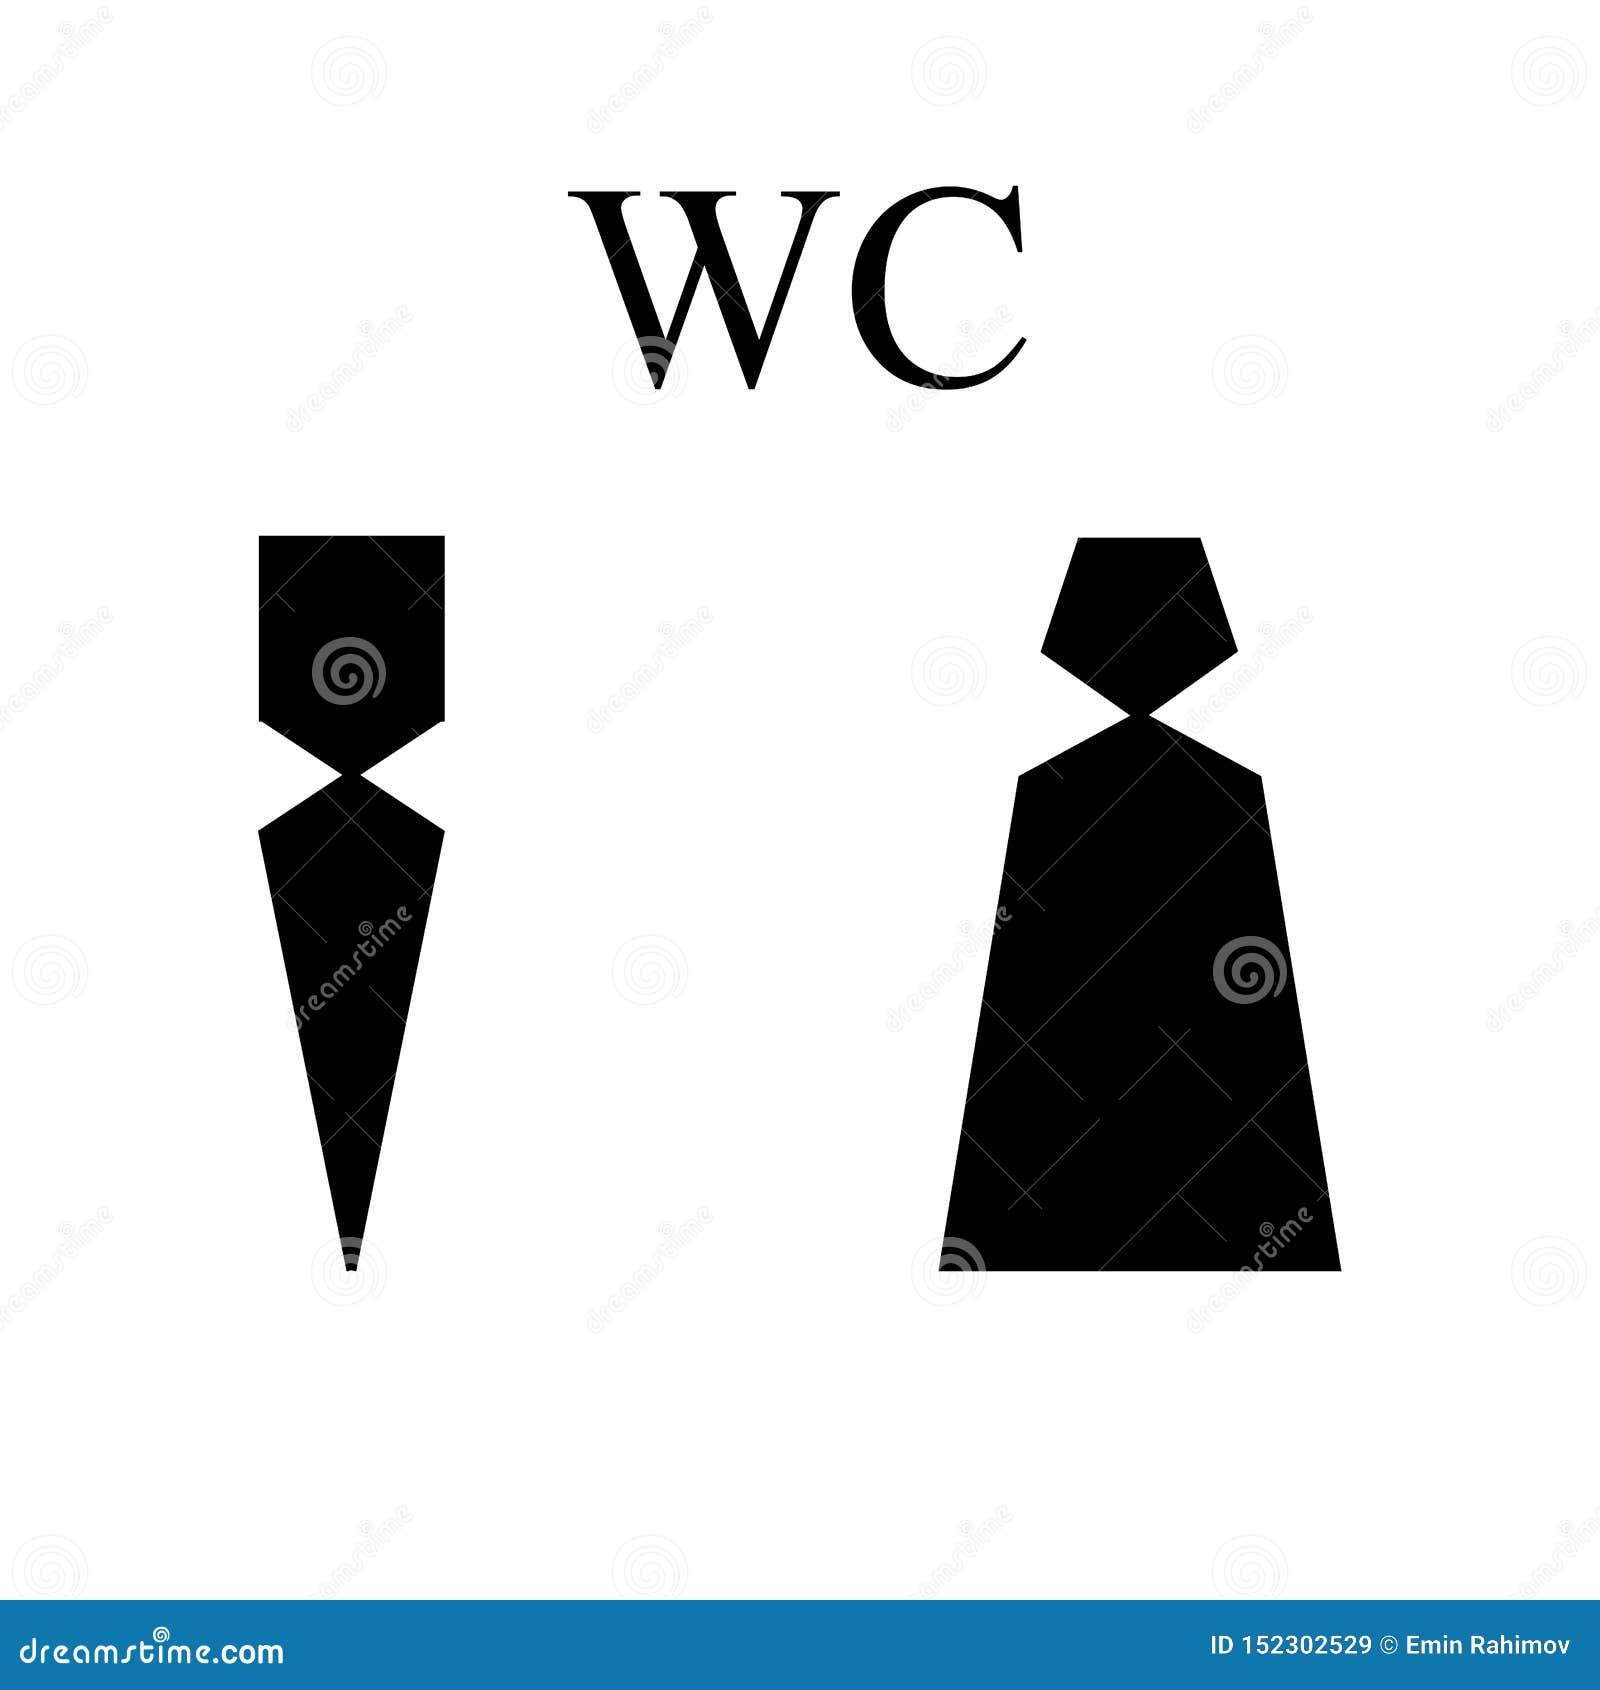 WC icon. Man and Women silhouette - eps ten